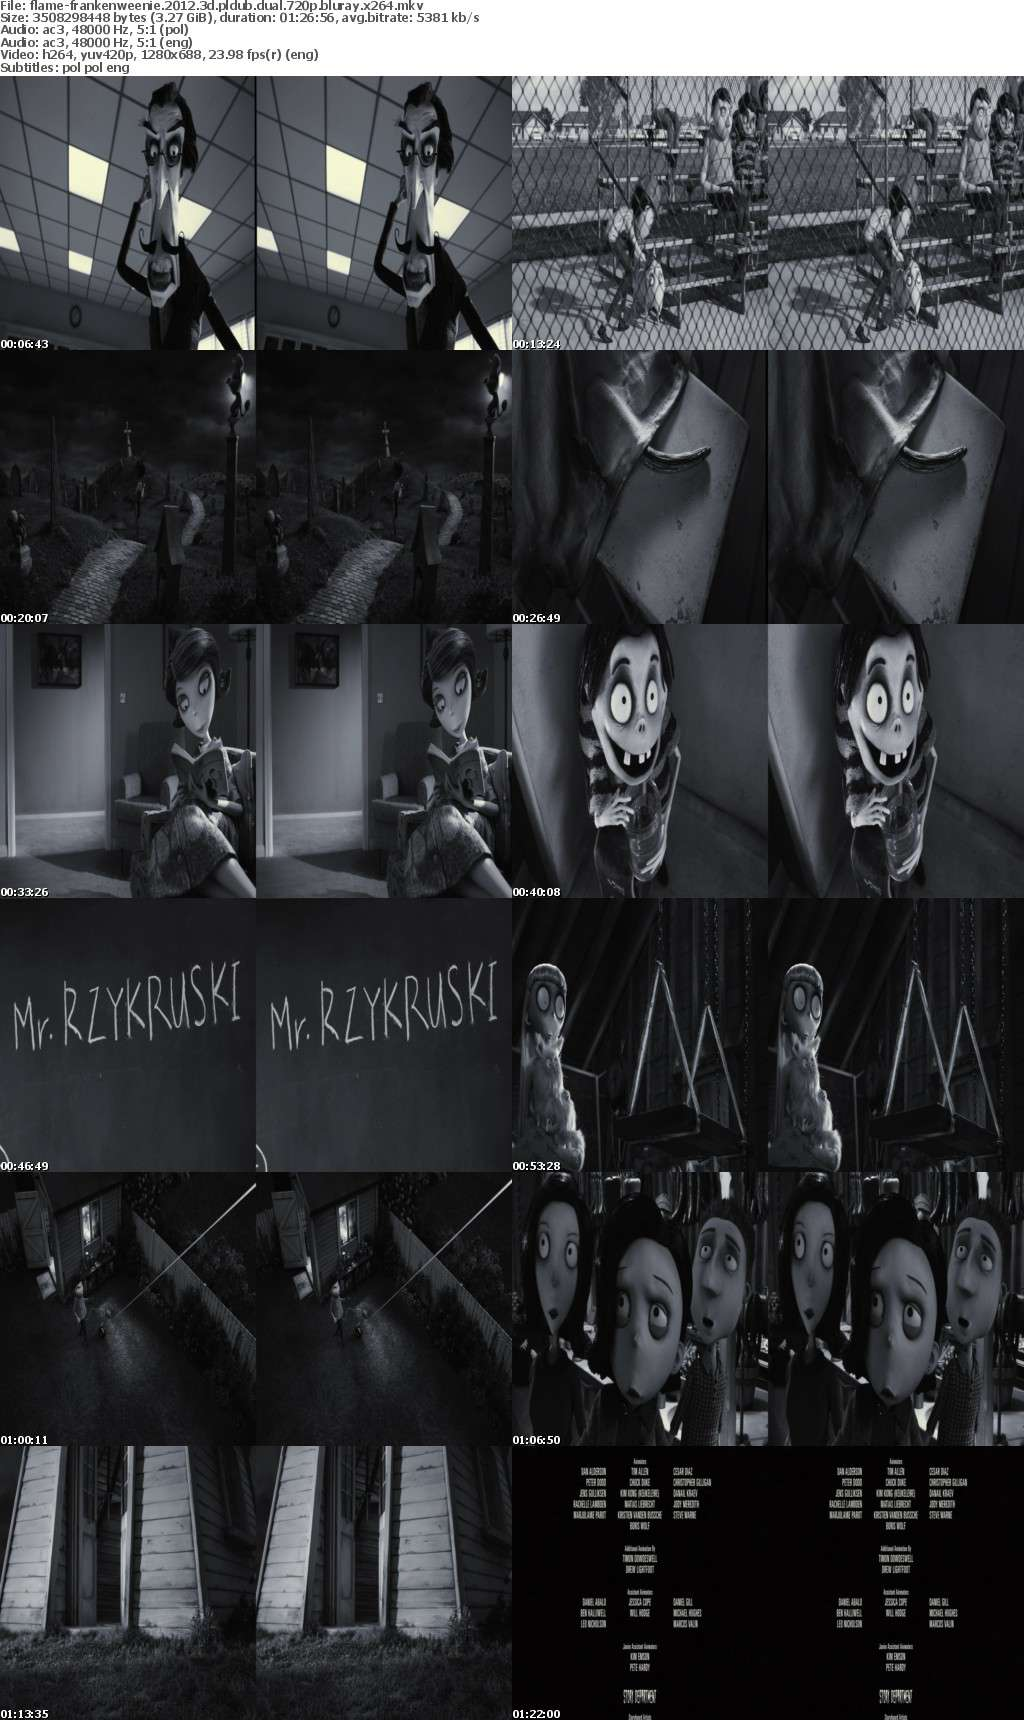 Frankenweenie 2012 3D PLDUB DUAL 720p BluRay x264-FLAME